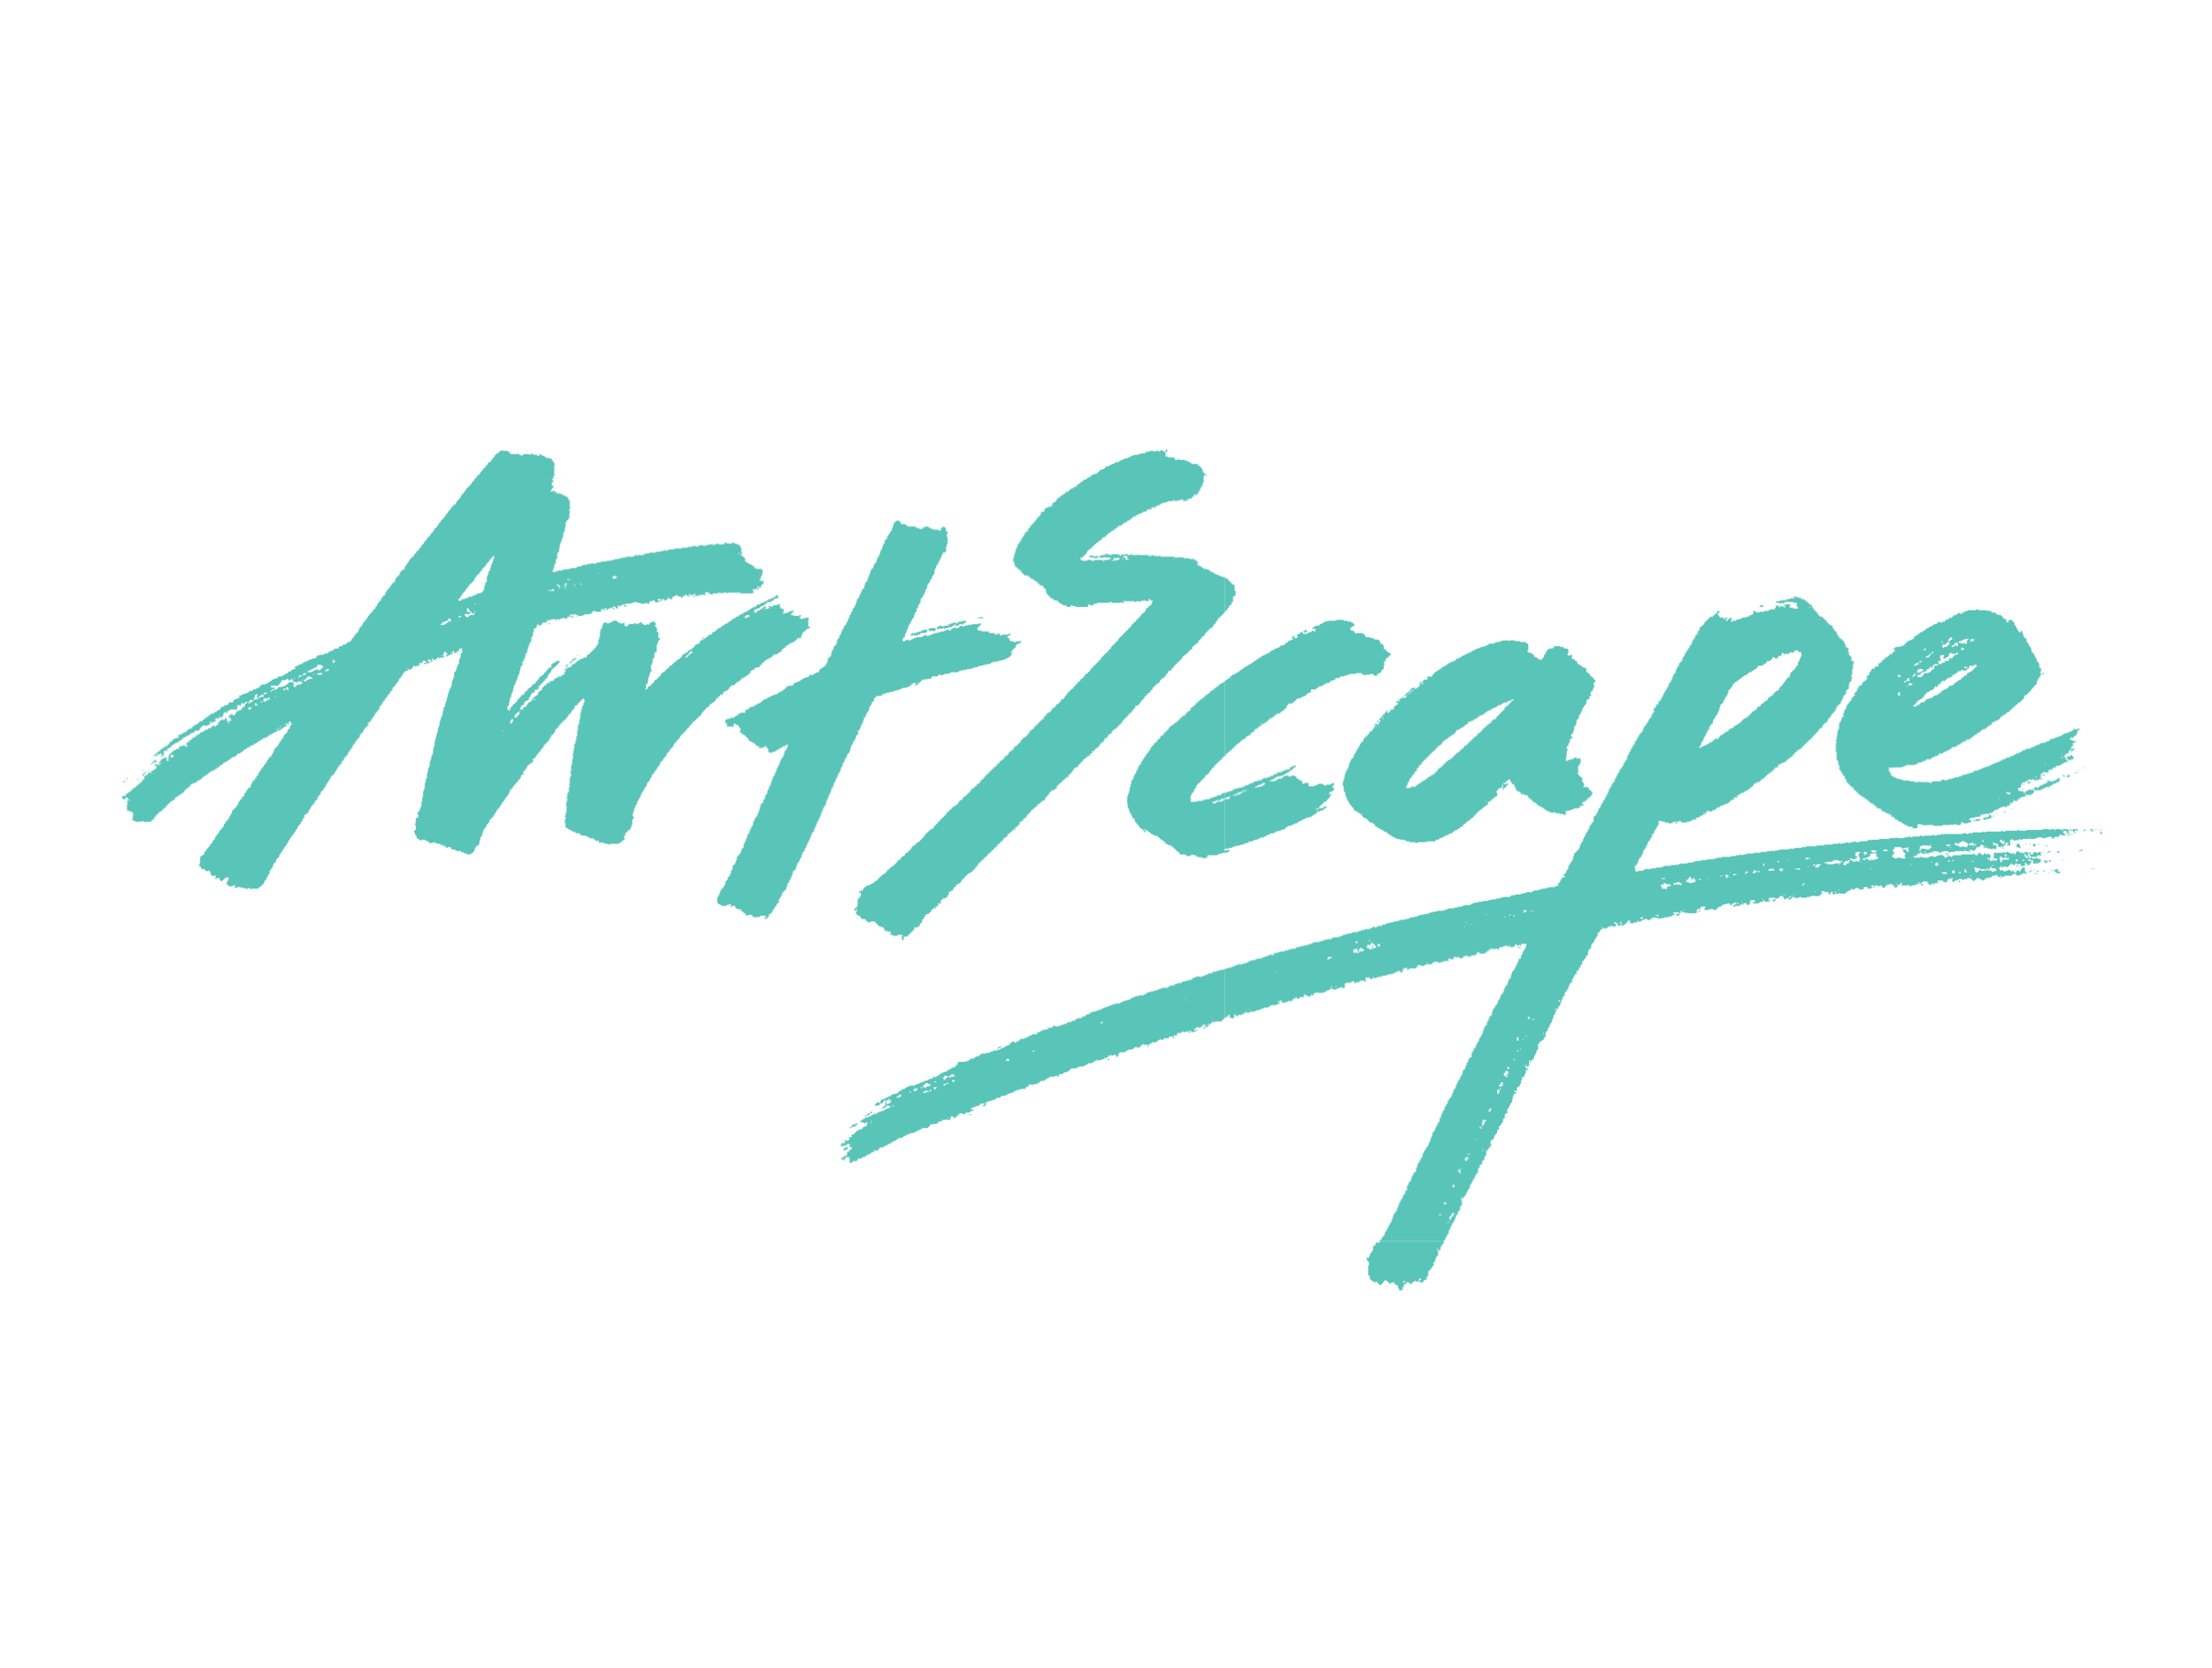 Artscape Lettering